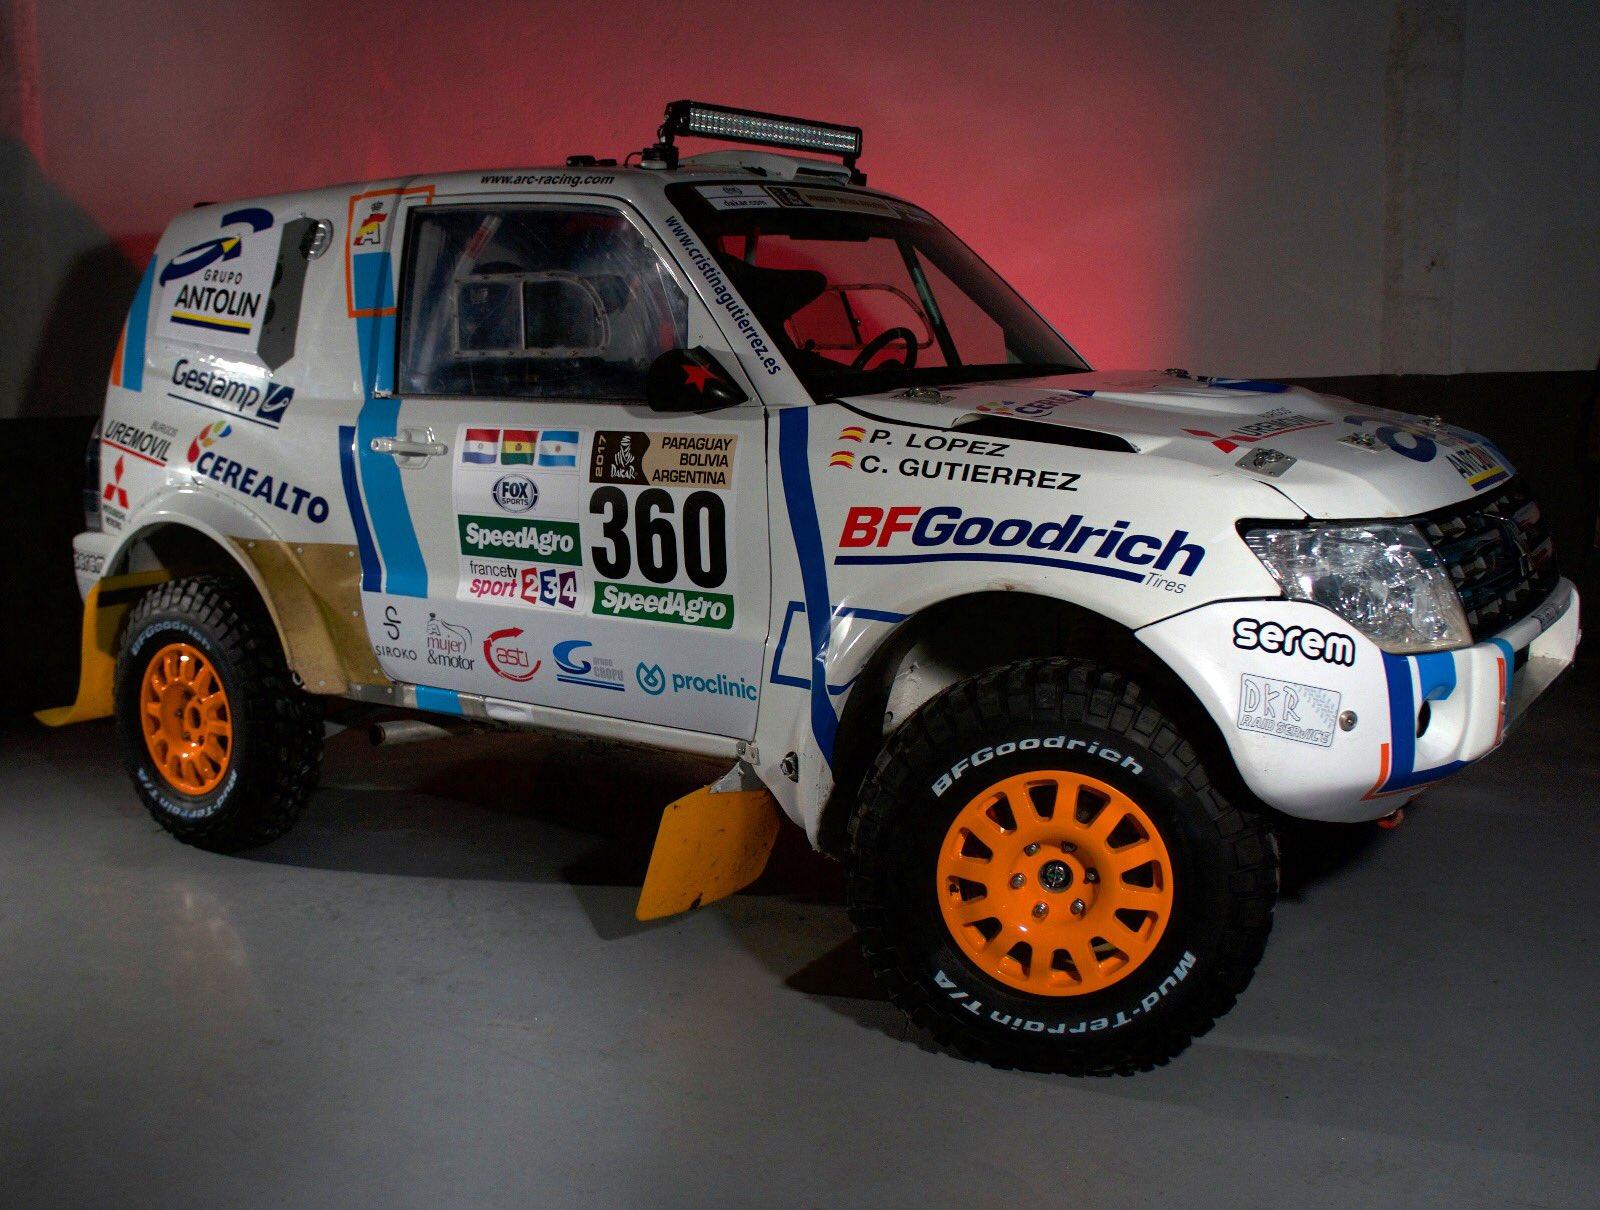 2017 Rallye Raid Dakar Paraguay - Bolivia - Argentina [2-14 Enero] - Página 5 CyWMLY7WgAAt7s0